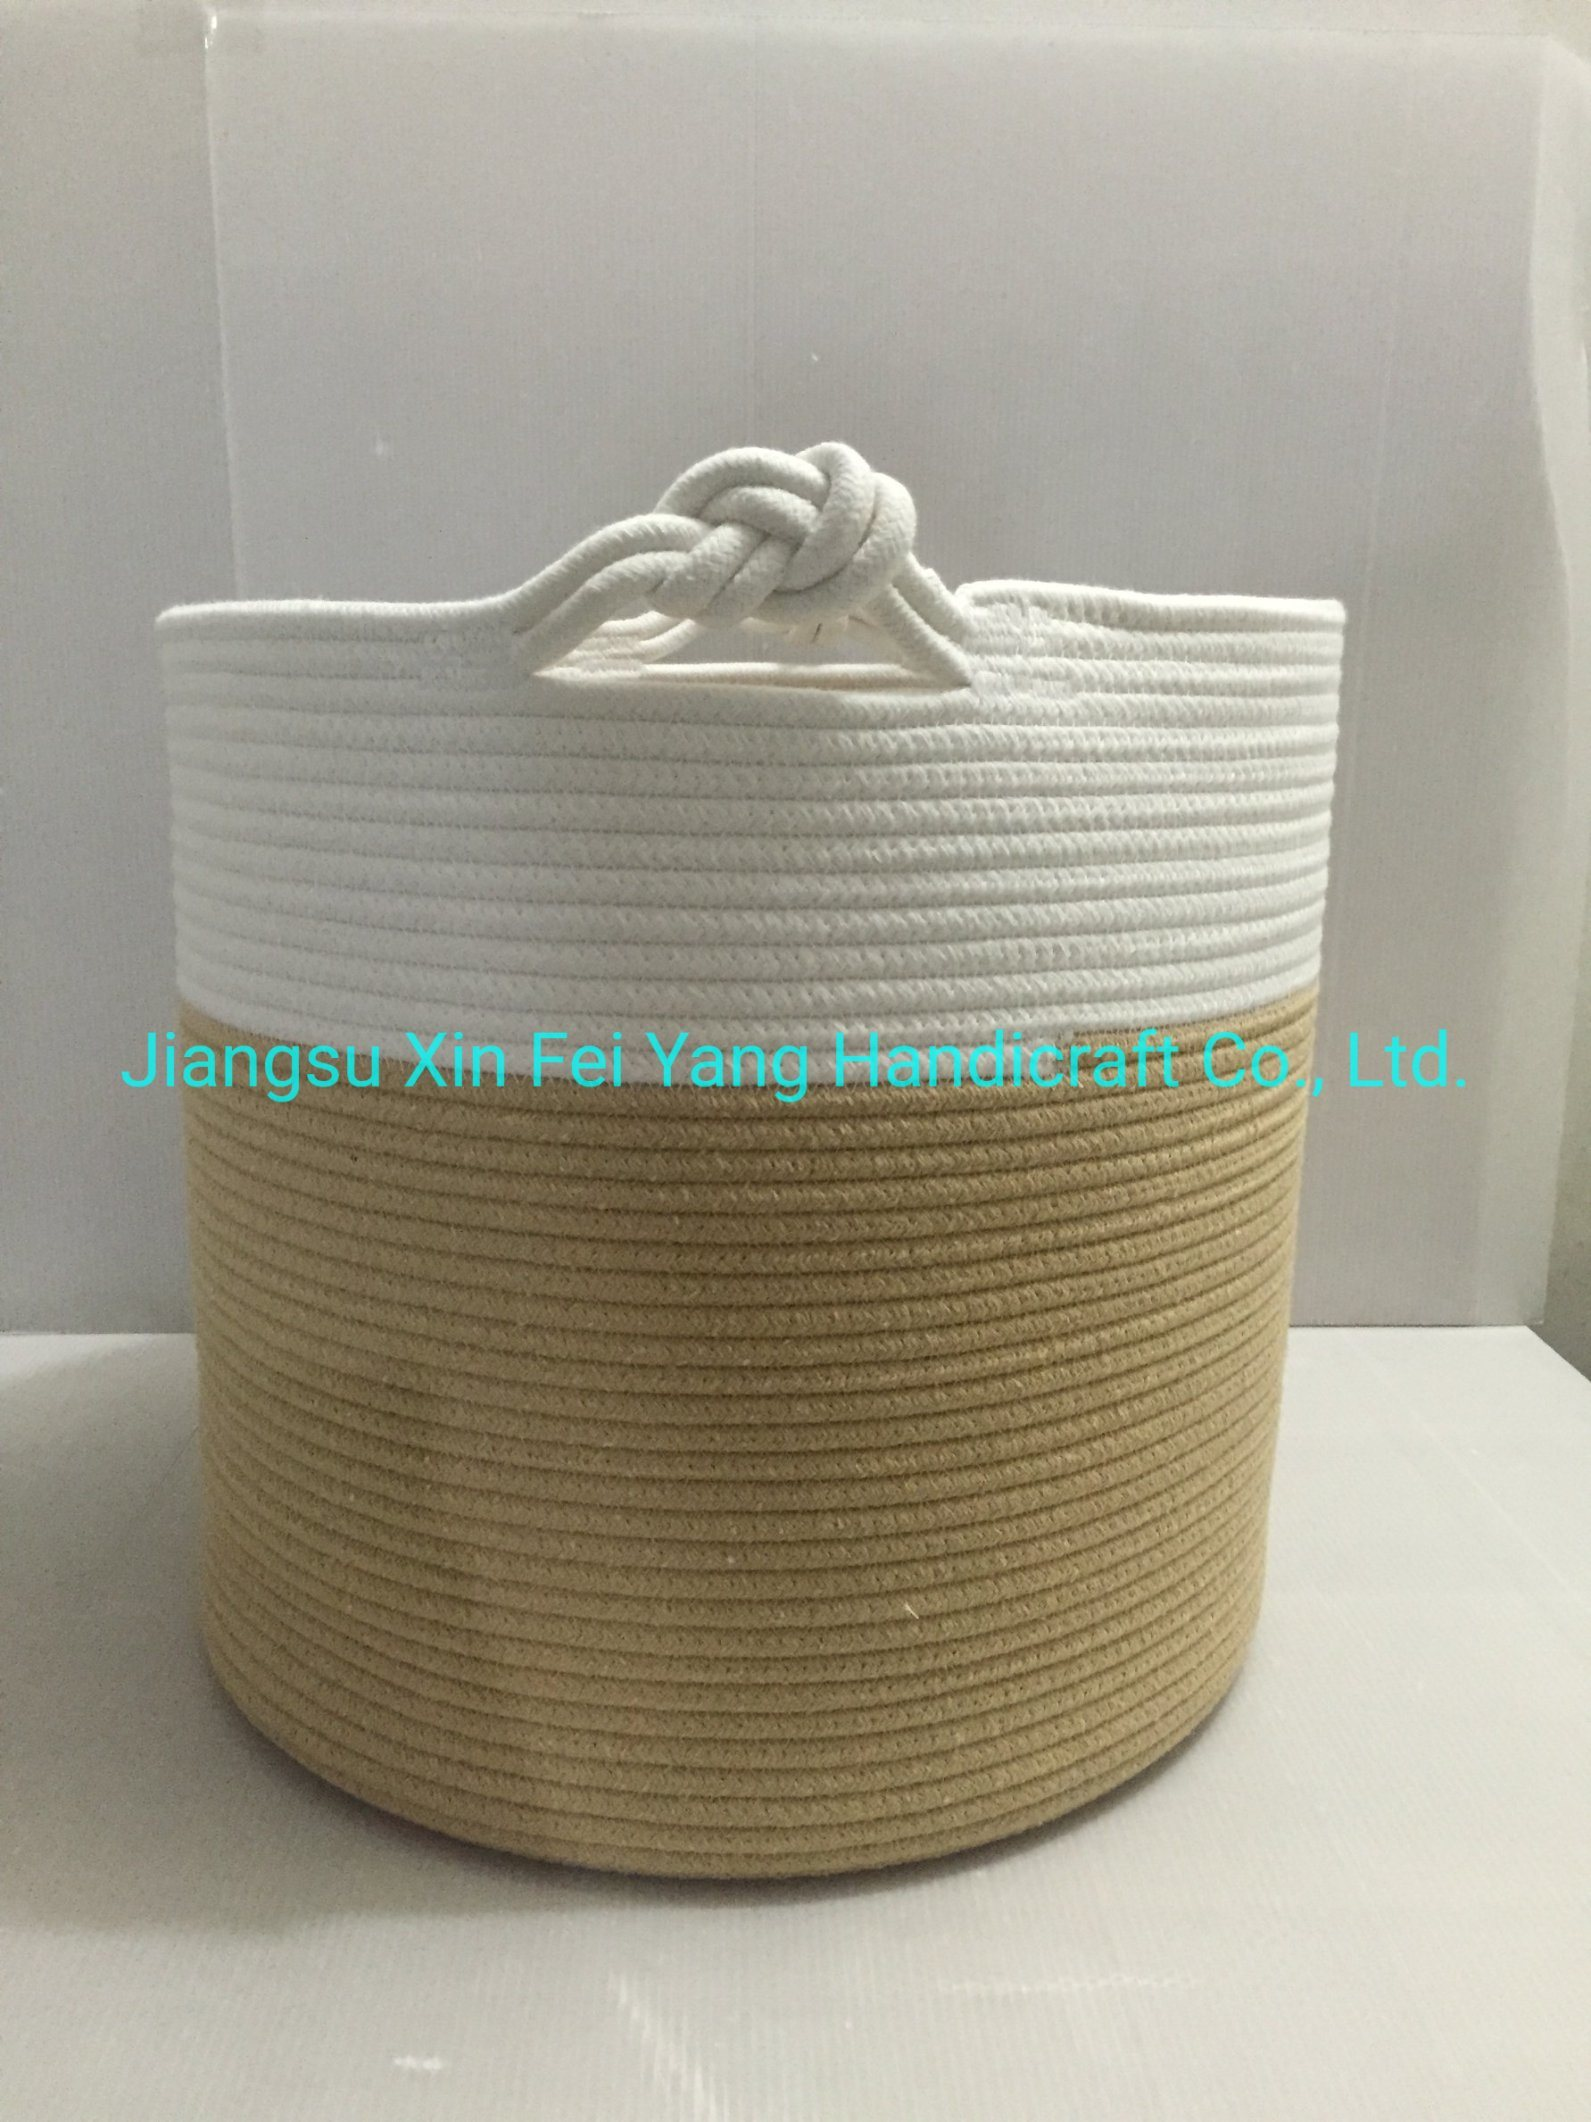 China Cotton Rope Basket 18 X 14 Baby Laundry Basket Laundry Hamper Woven Blanket Basket Nursery Bin Organizer Toys Storage Basket With Lucky Knots Handle China Baby Laundry Basket And Nursery Bin Organizer Price